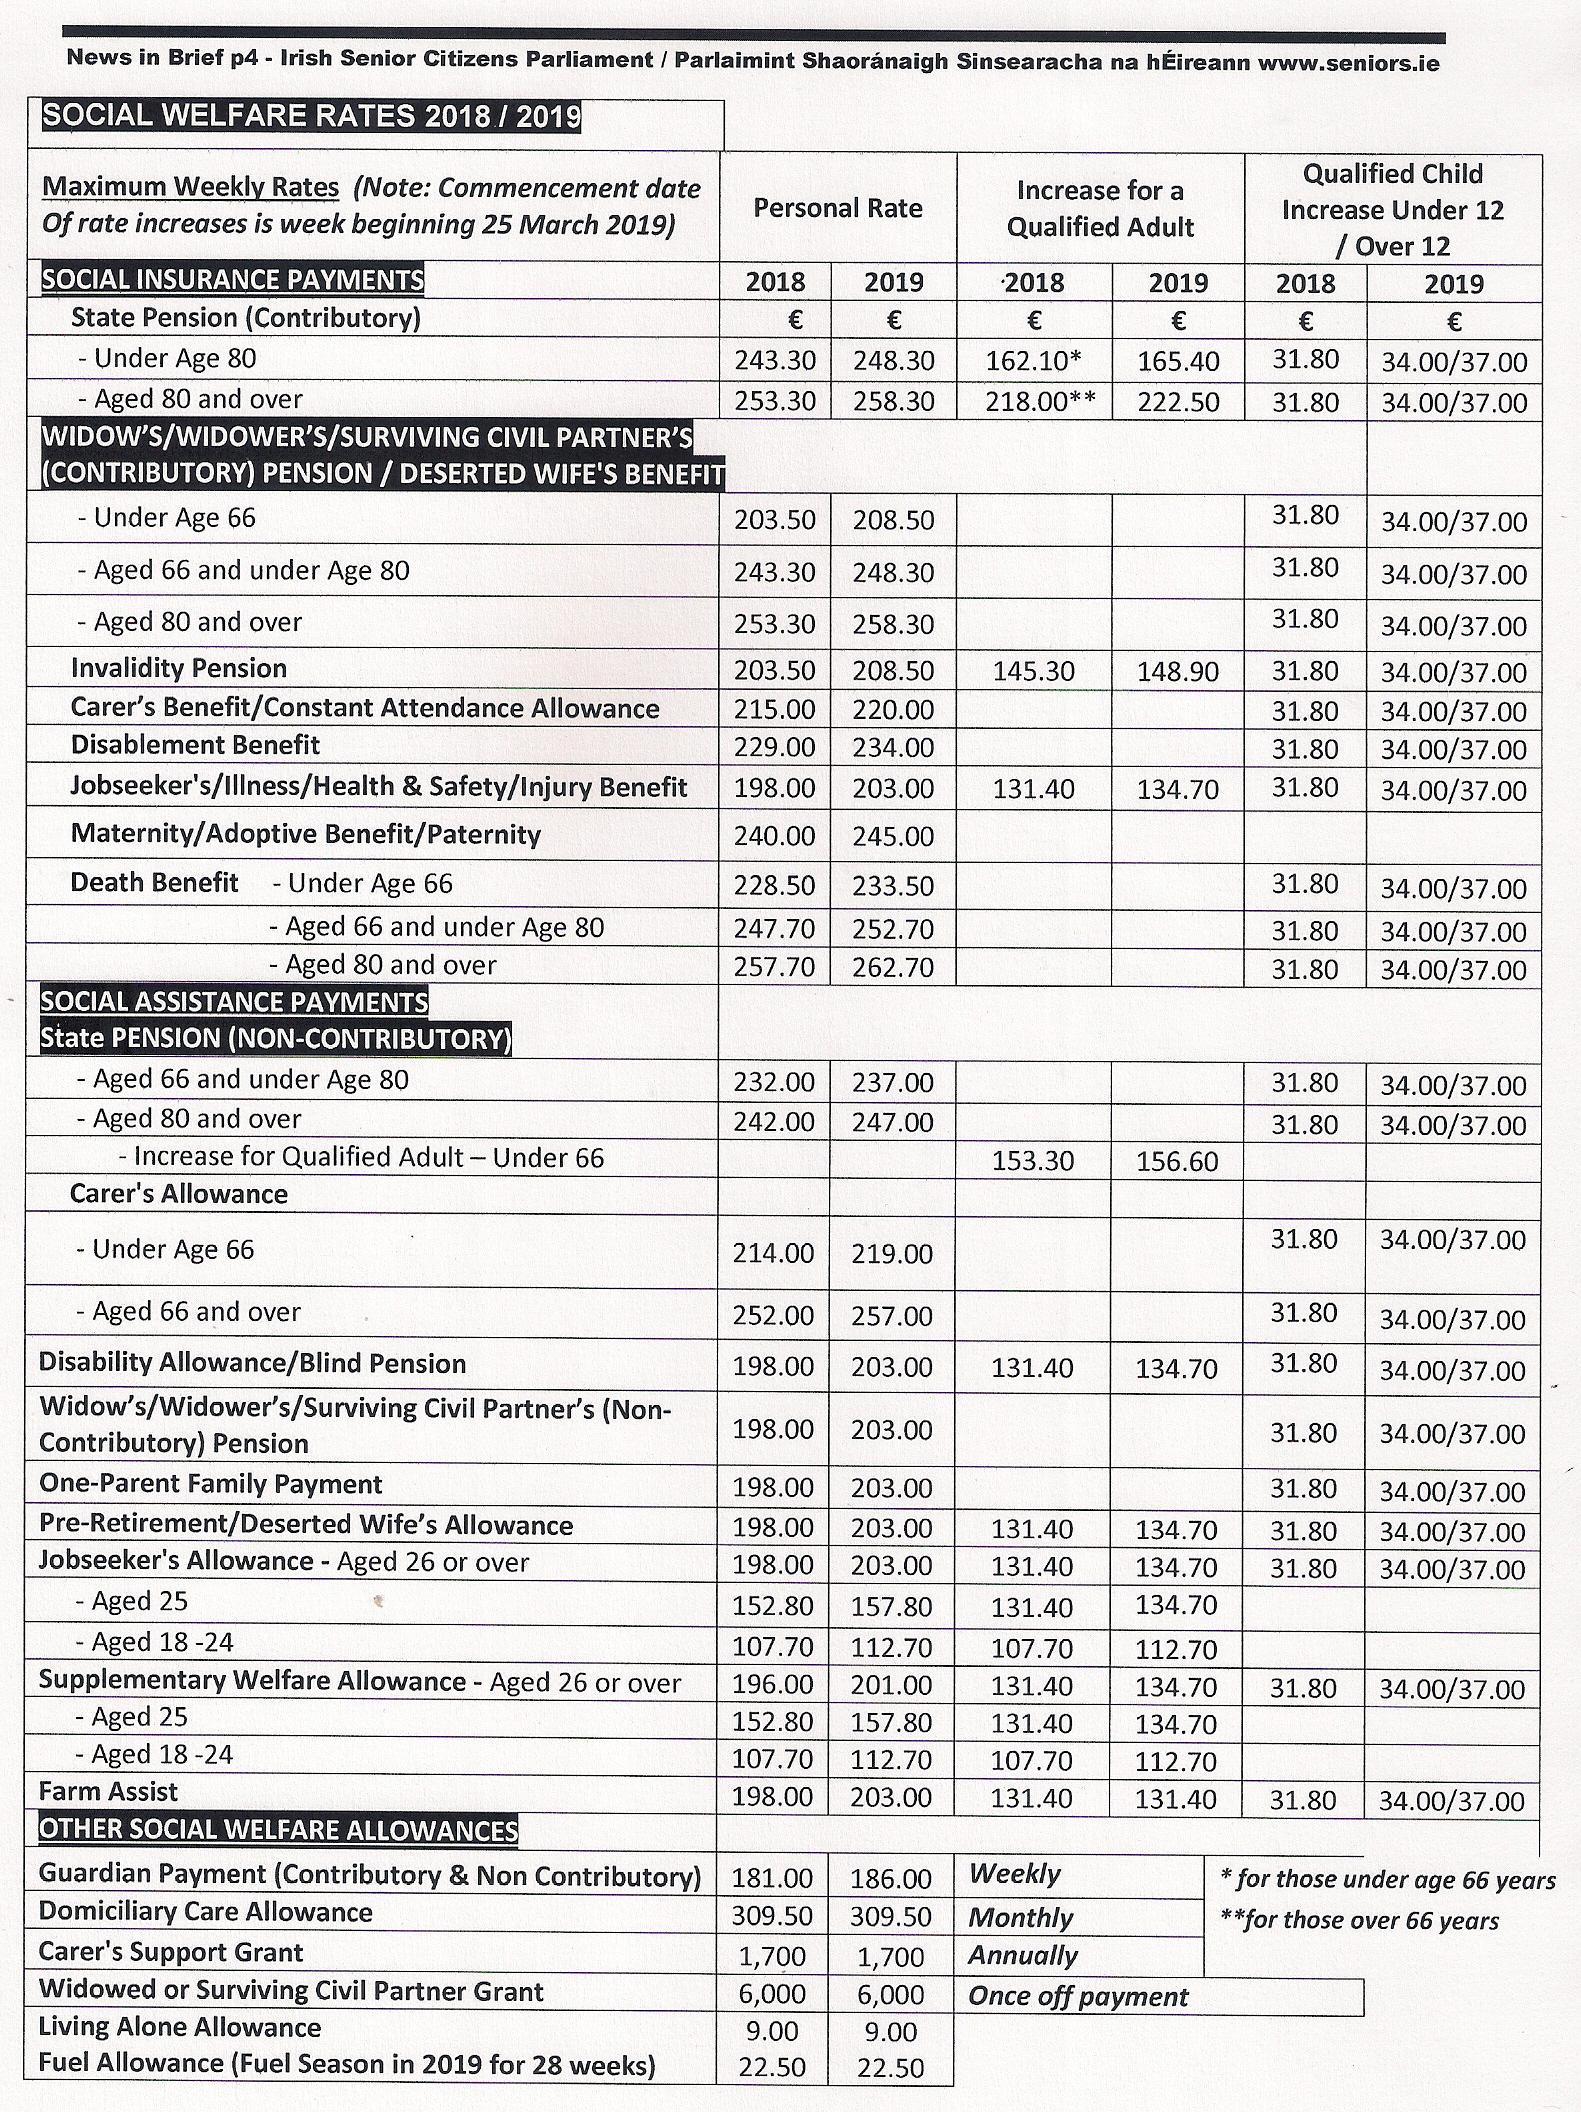 NIB SW Rates p40001